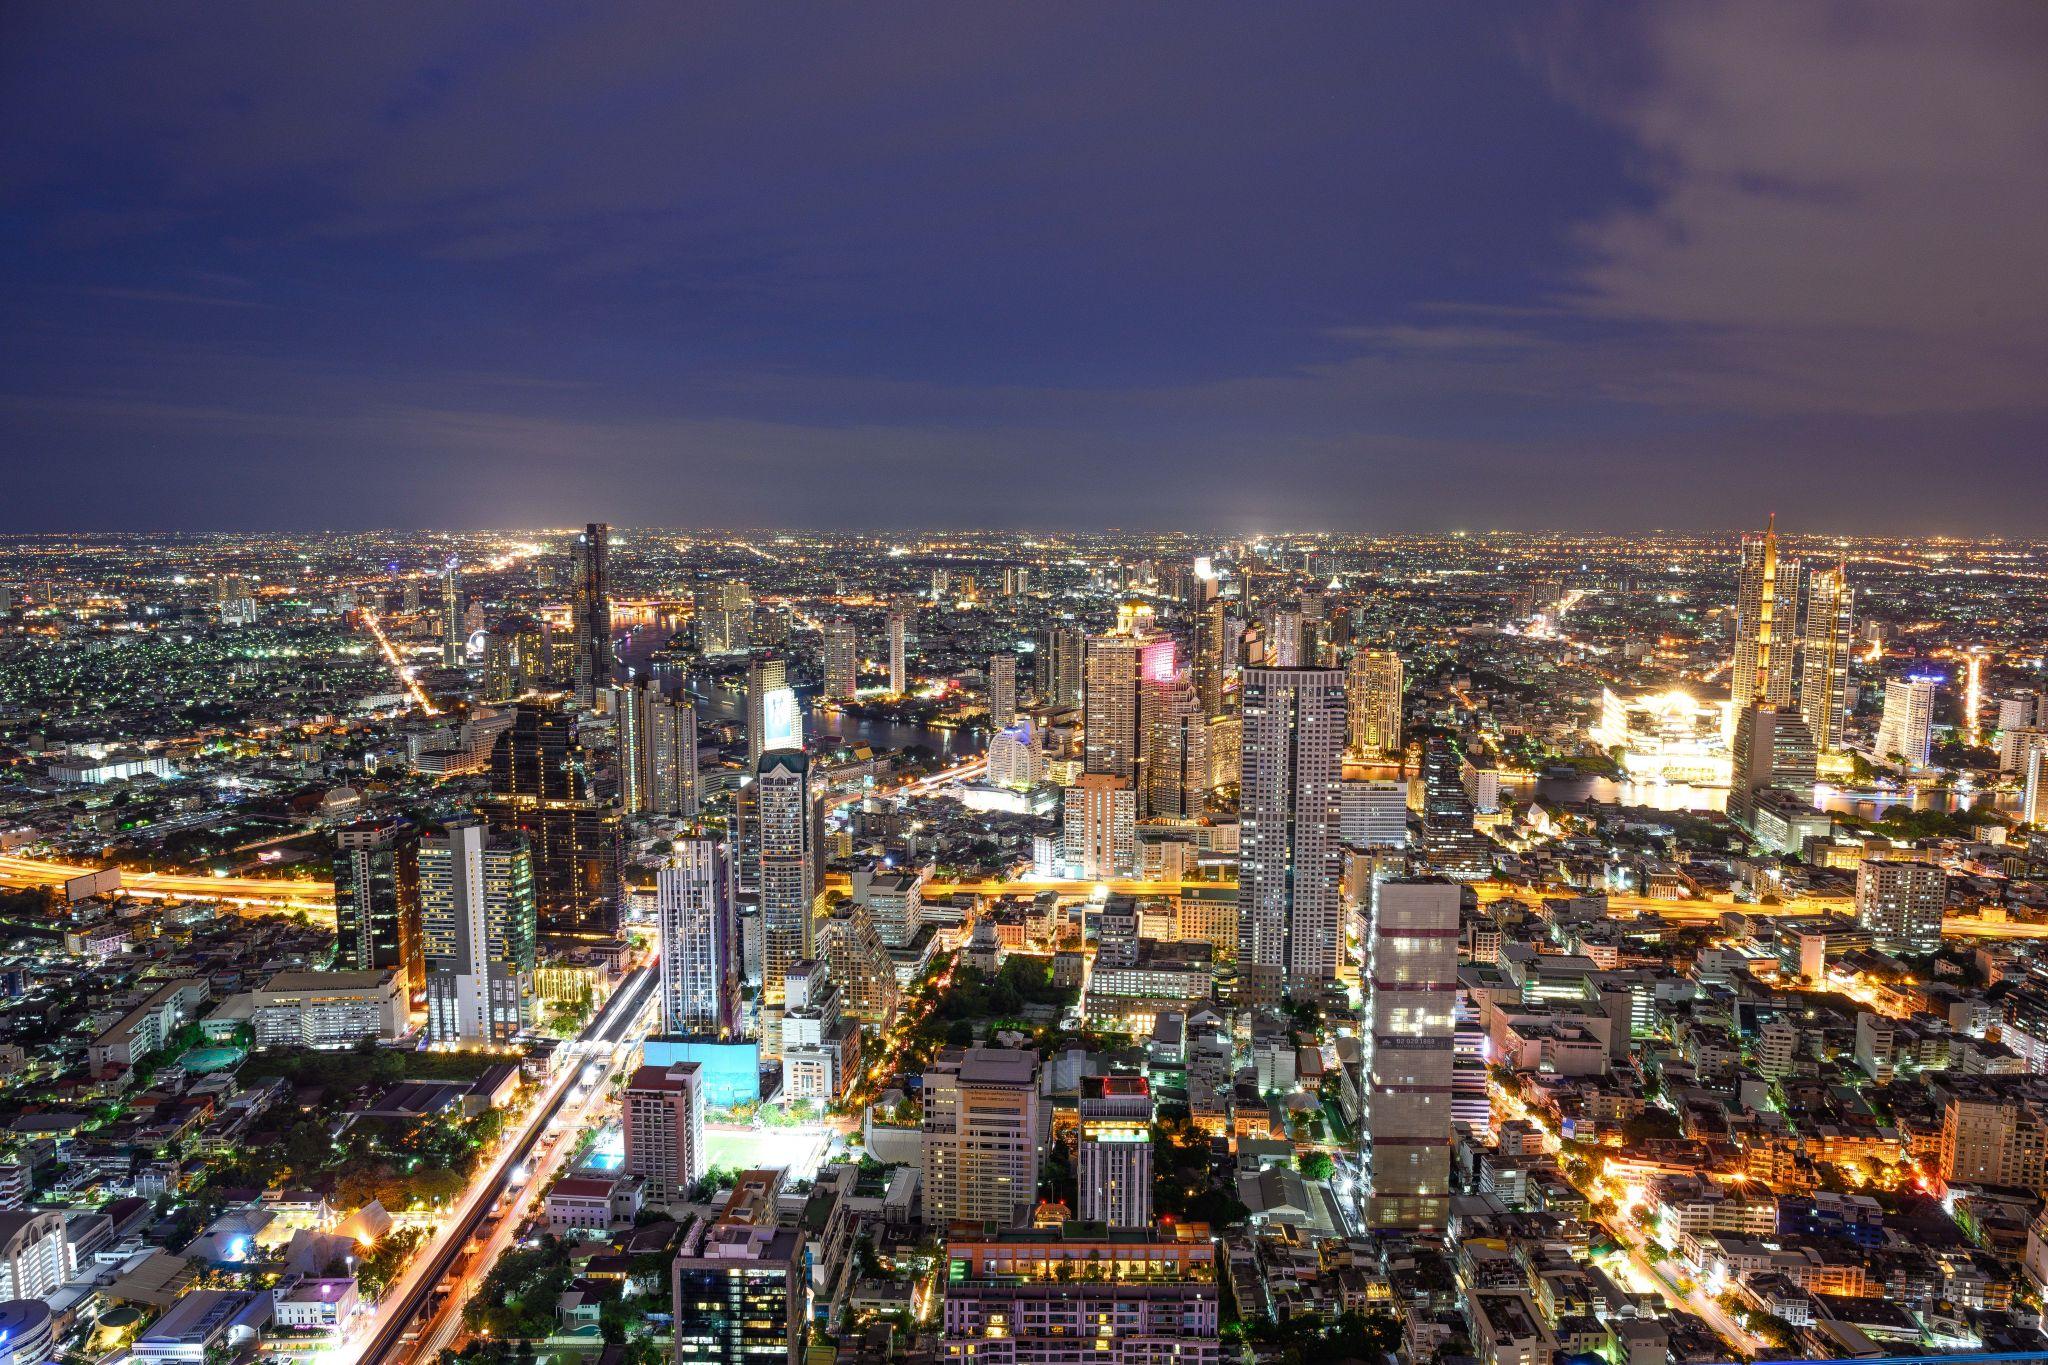 Bangkok Skywalk Night View, Thailand